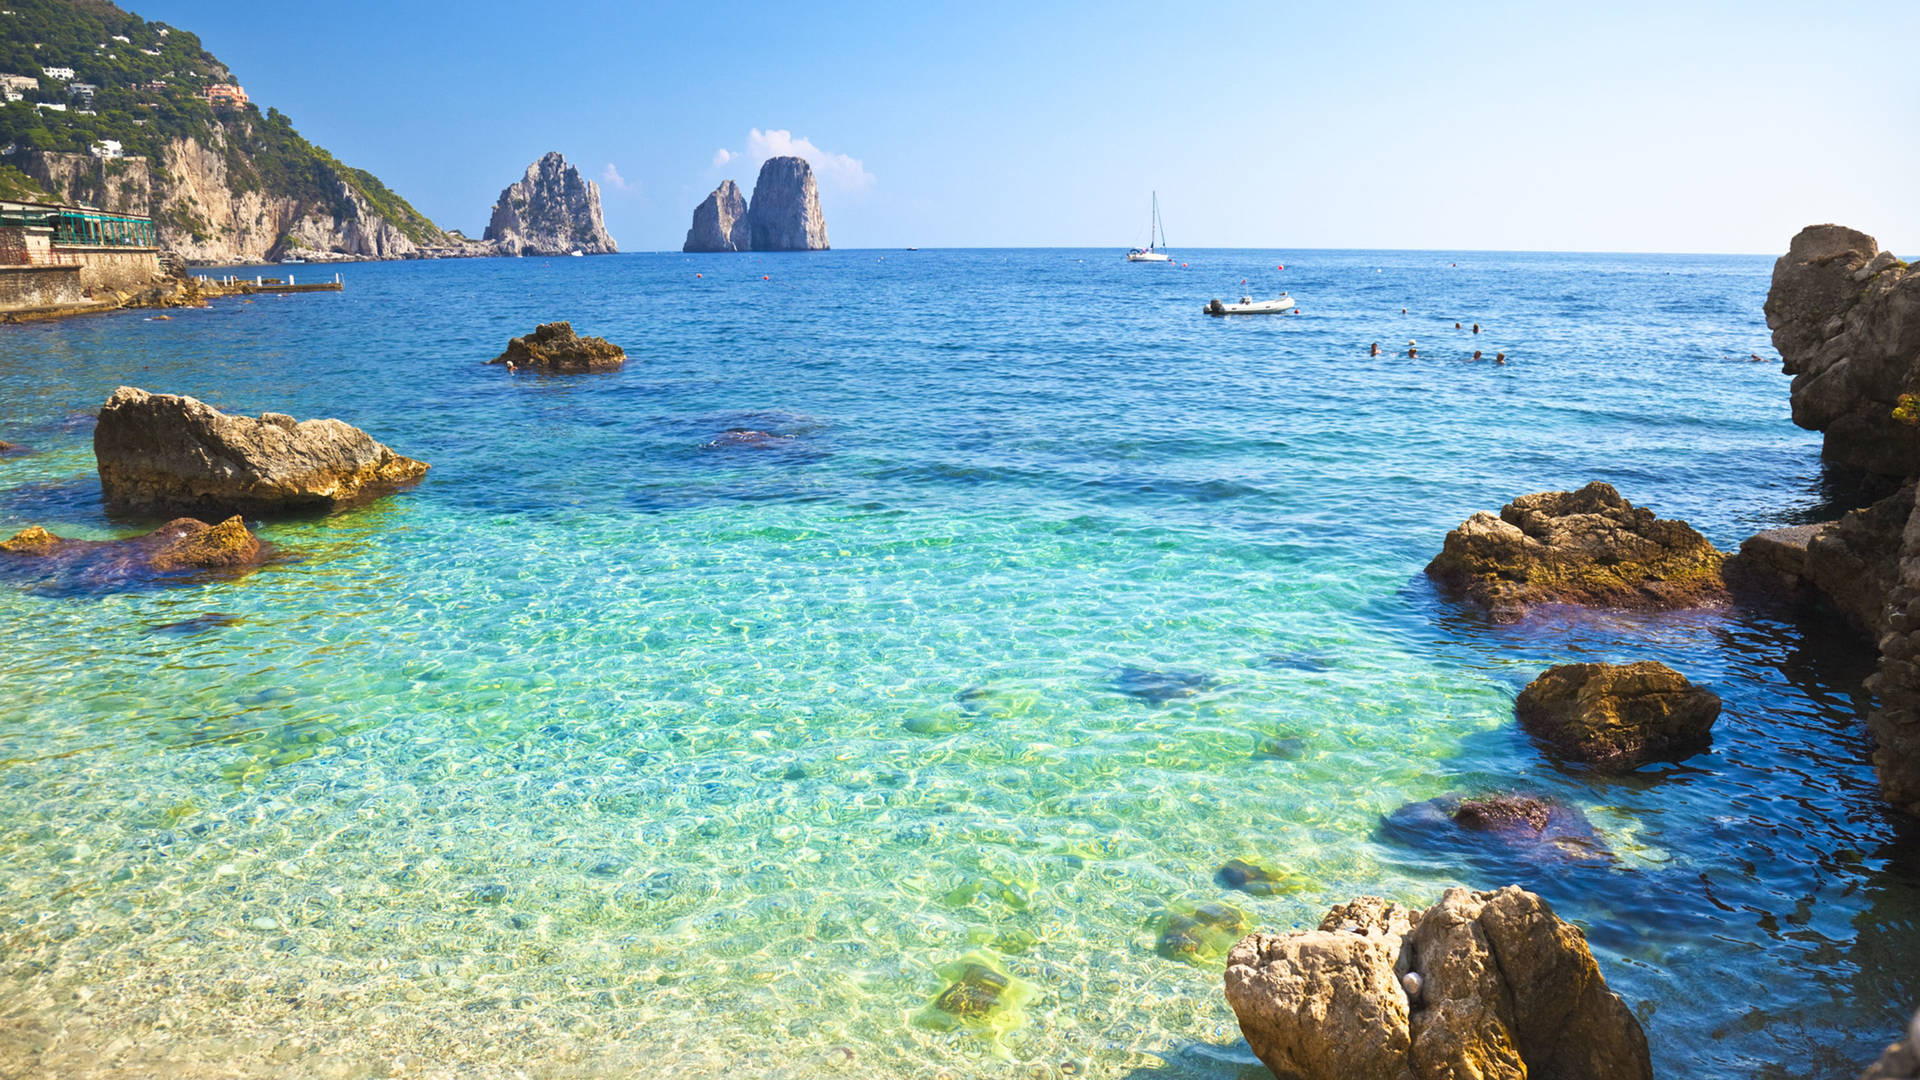 Sunny beach in Capri, Italy